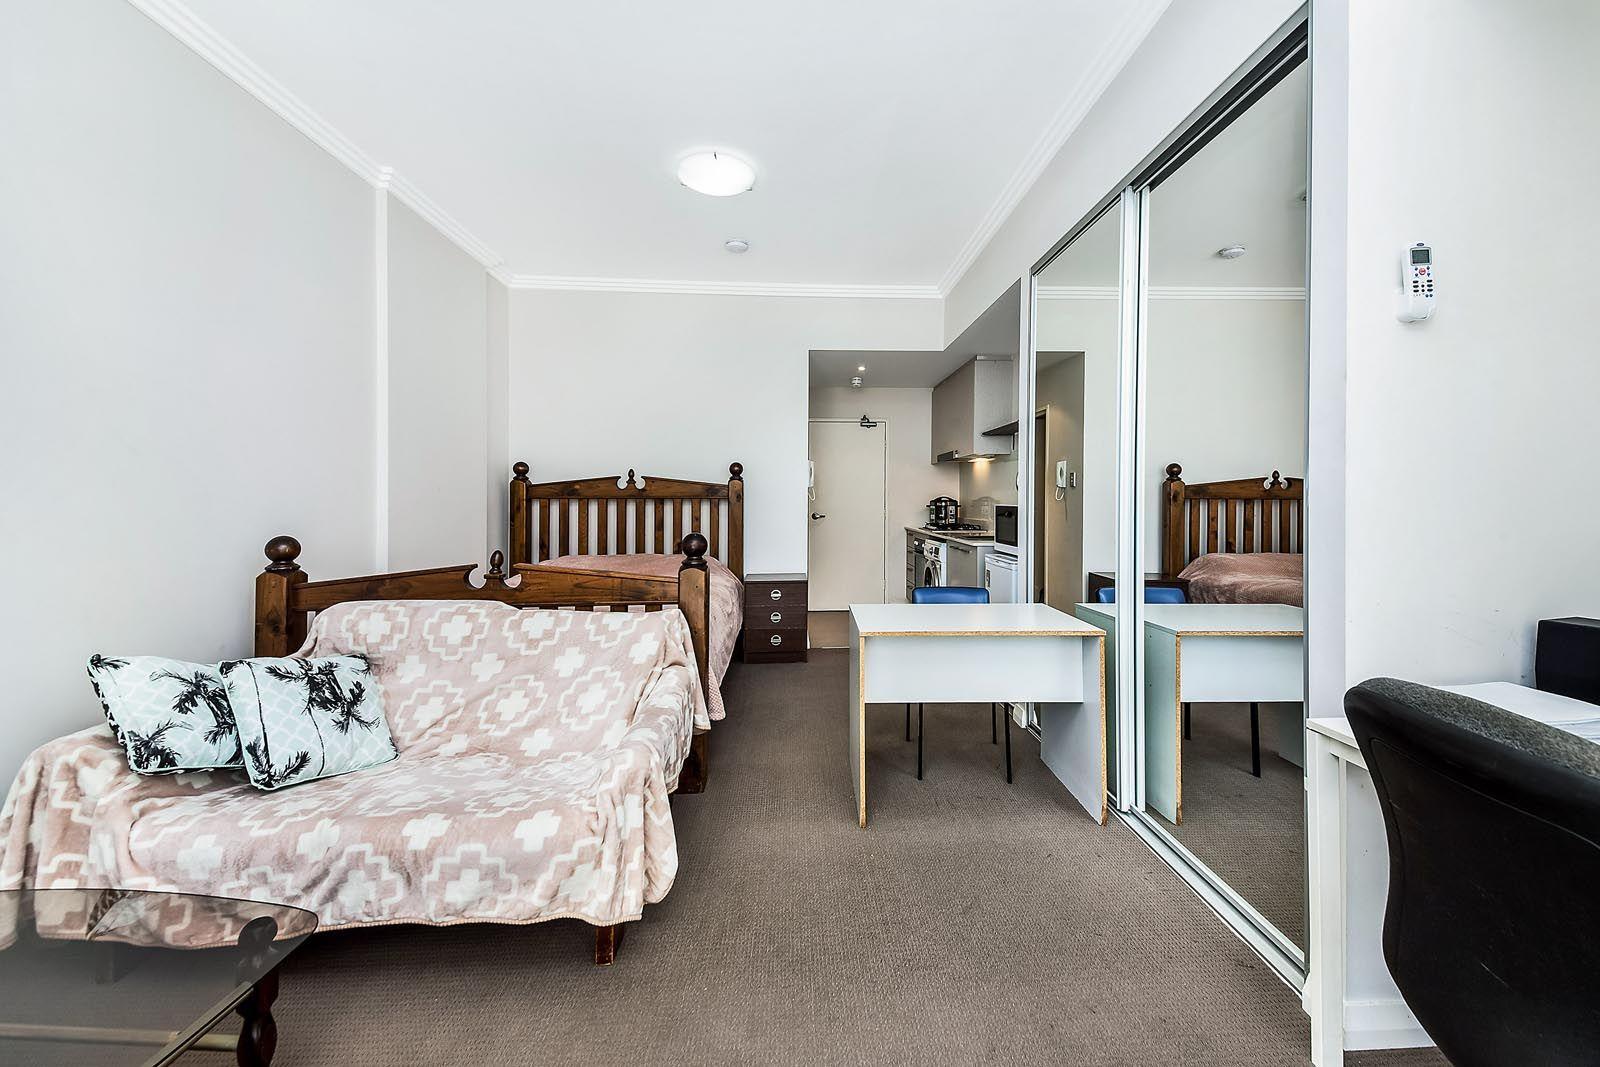 67/79-87 Beaconsfield Street, Silverwater NSW 2128, Image 0